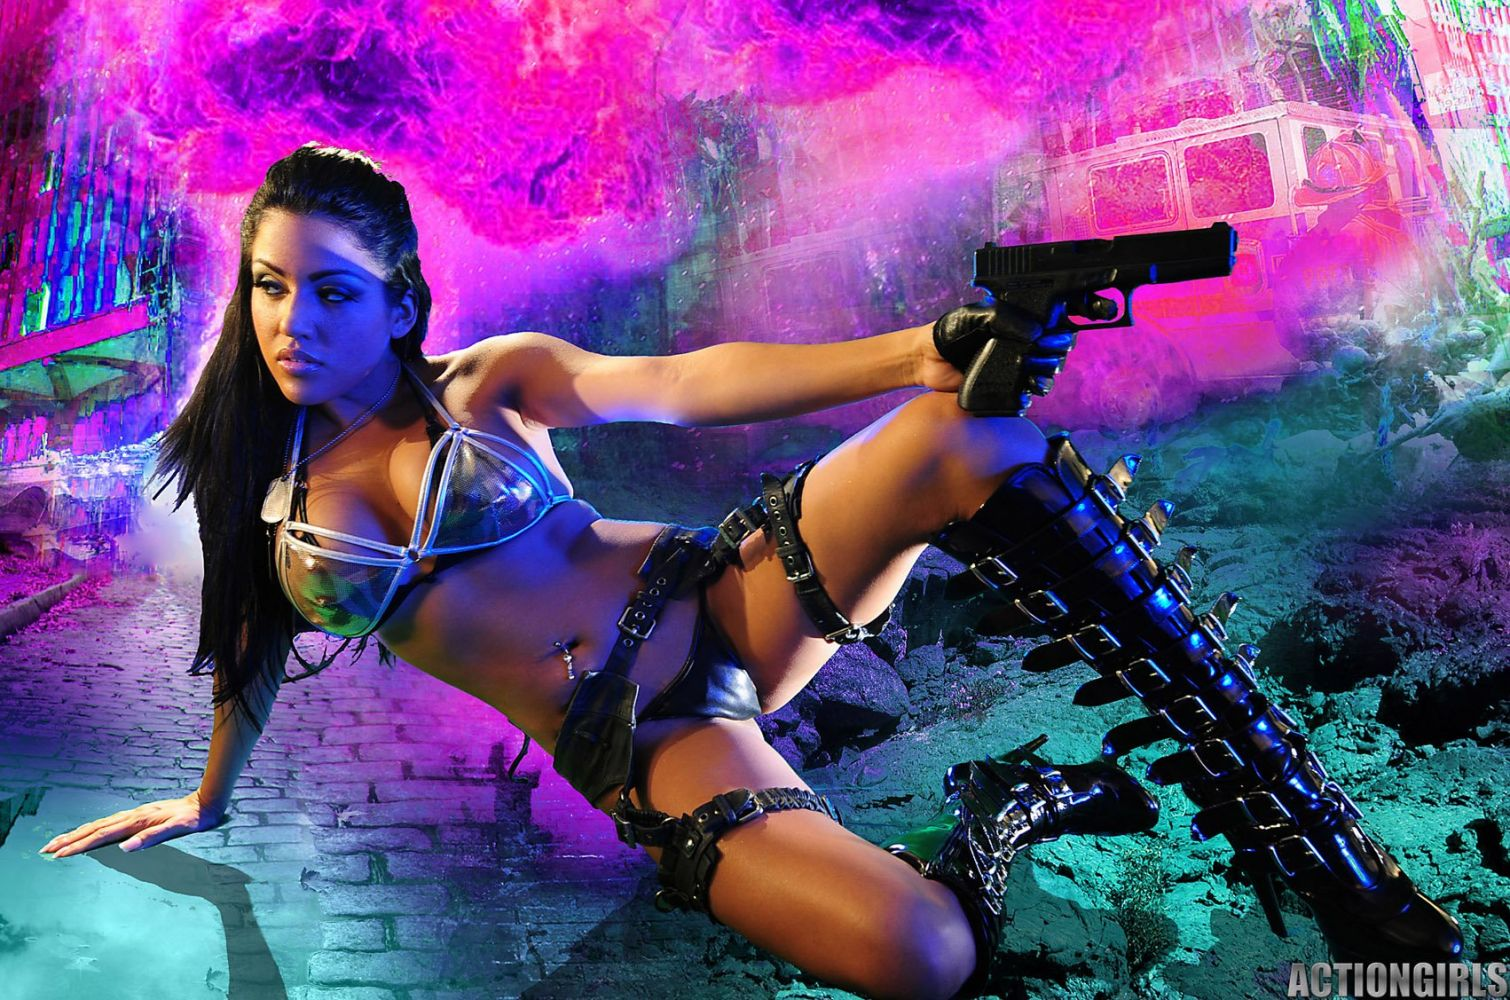 action-girls-tube-movies-sara-fucking